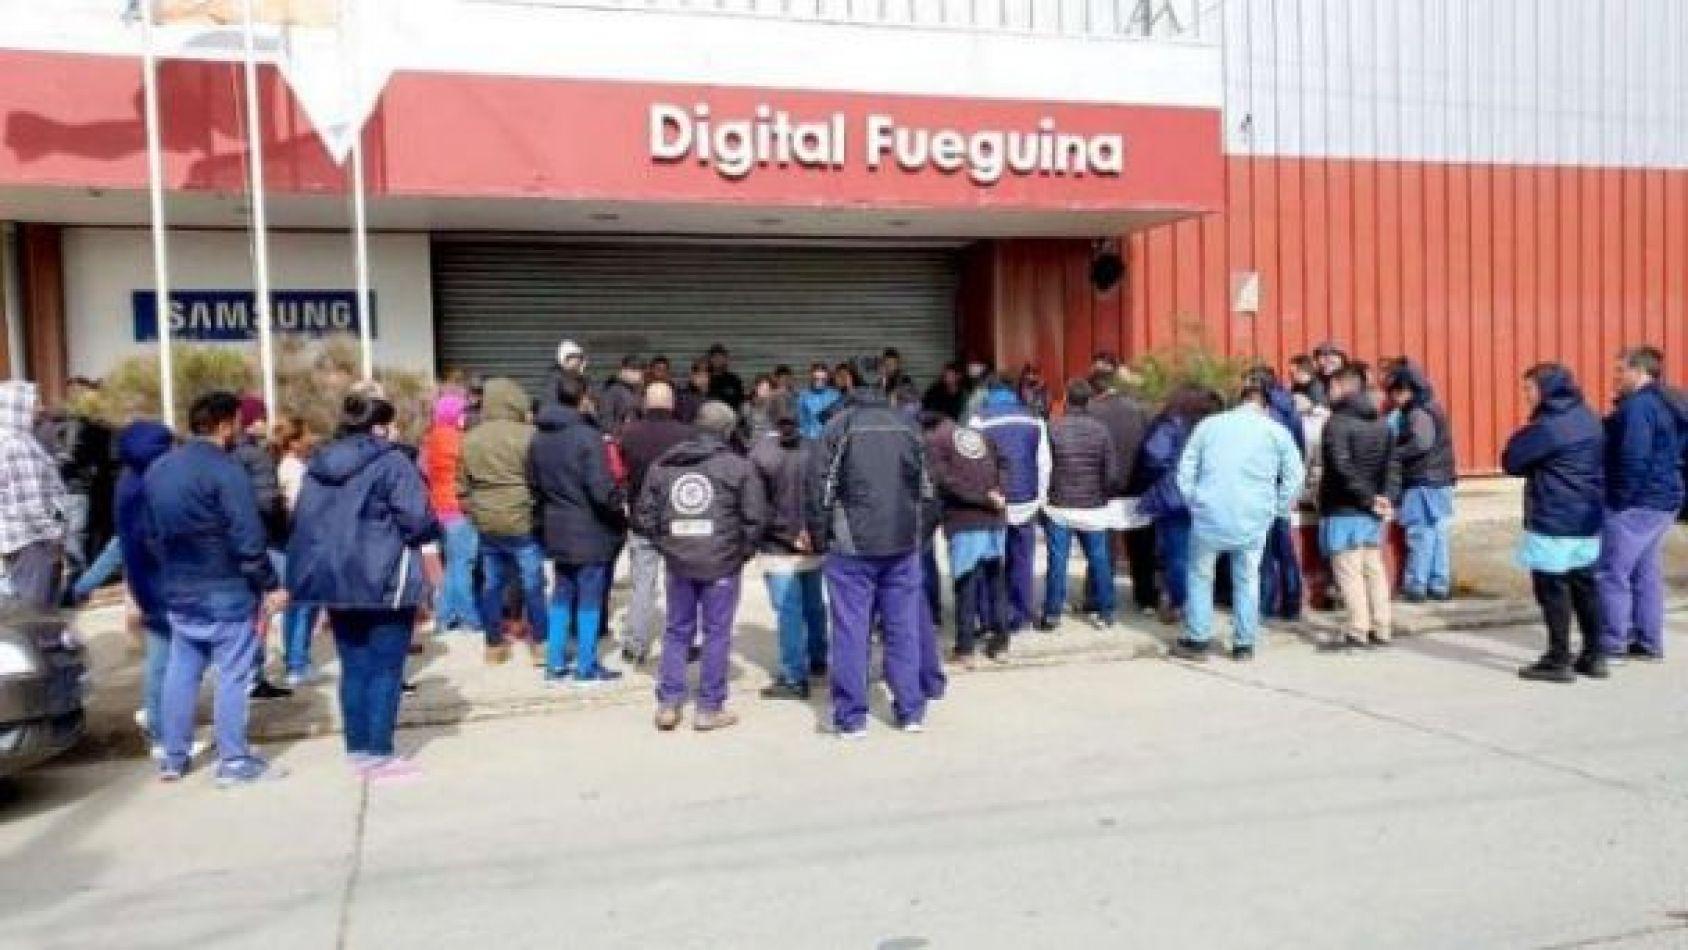 Momentos de tensión se viven en Digital Fueguina.